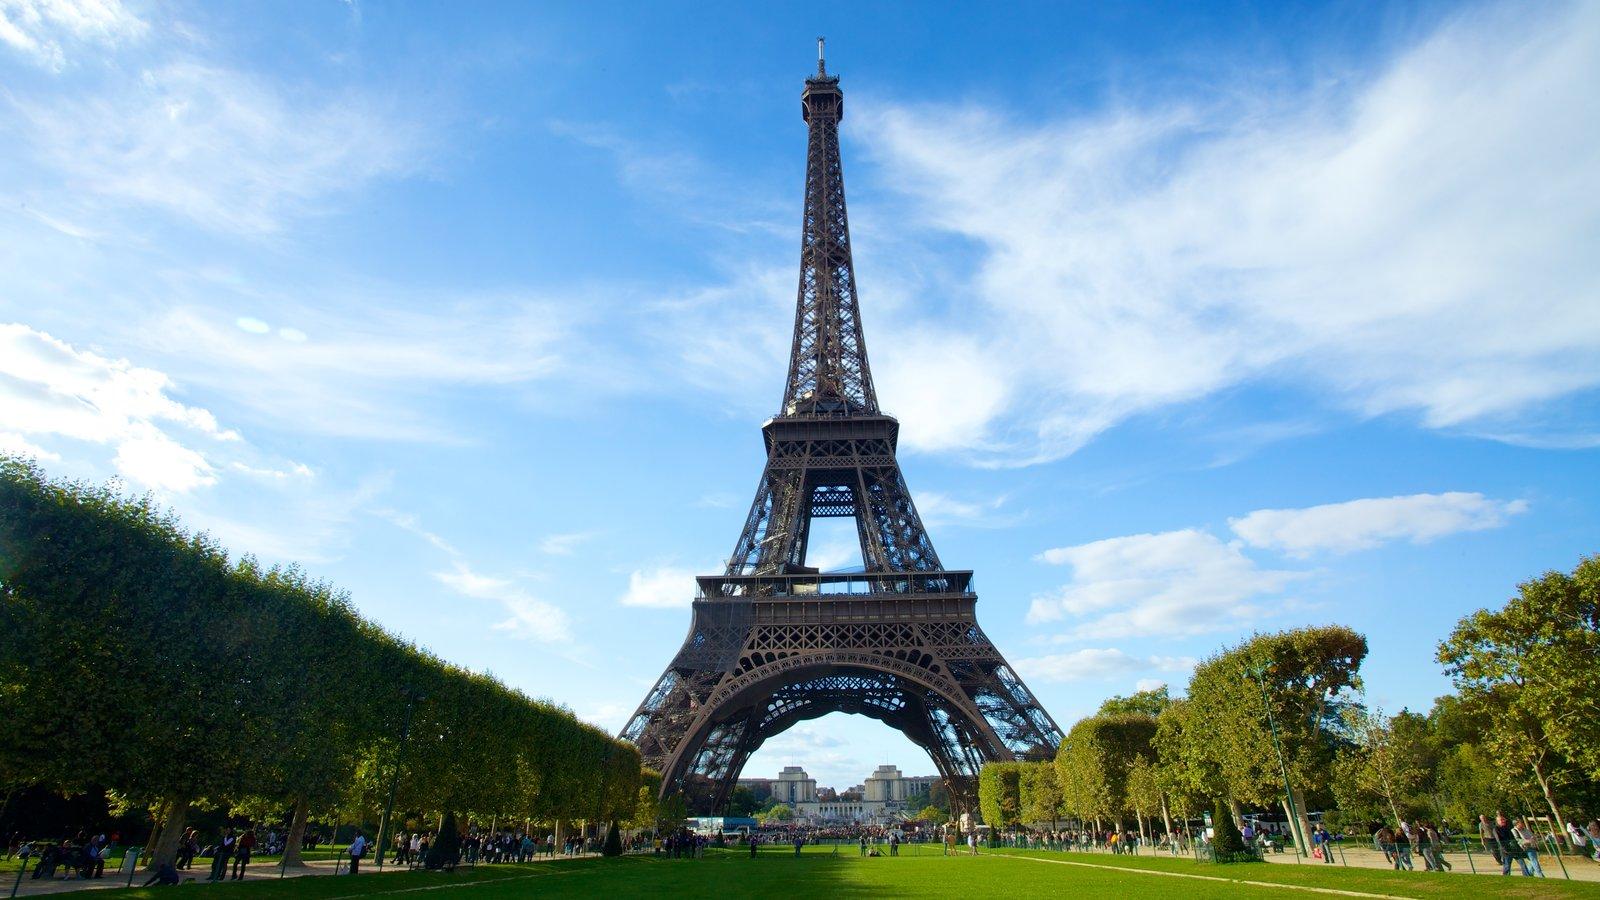 Torre Eiffel caracterizando um jardim e arquitetura de patrimônio